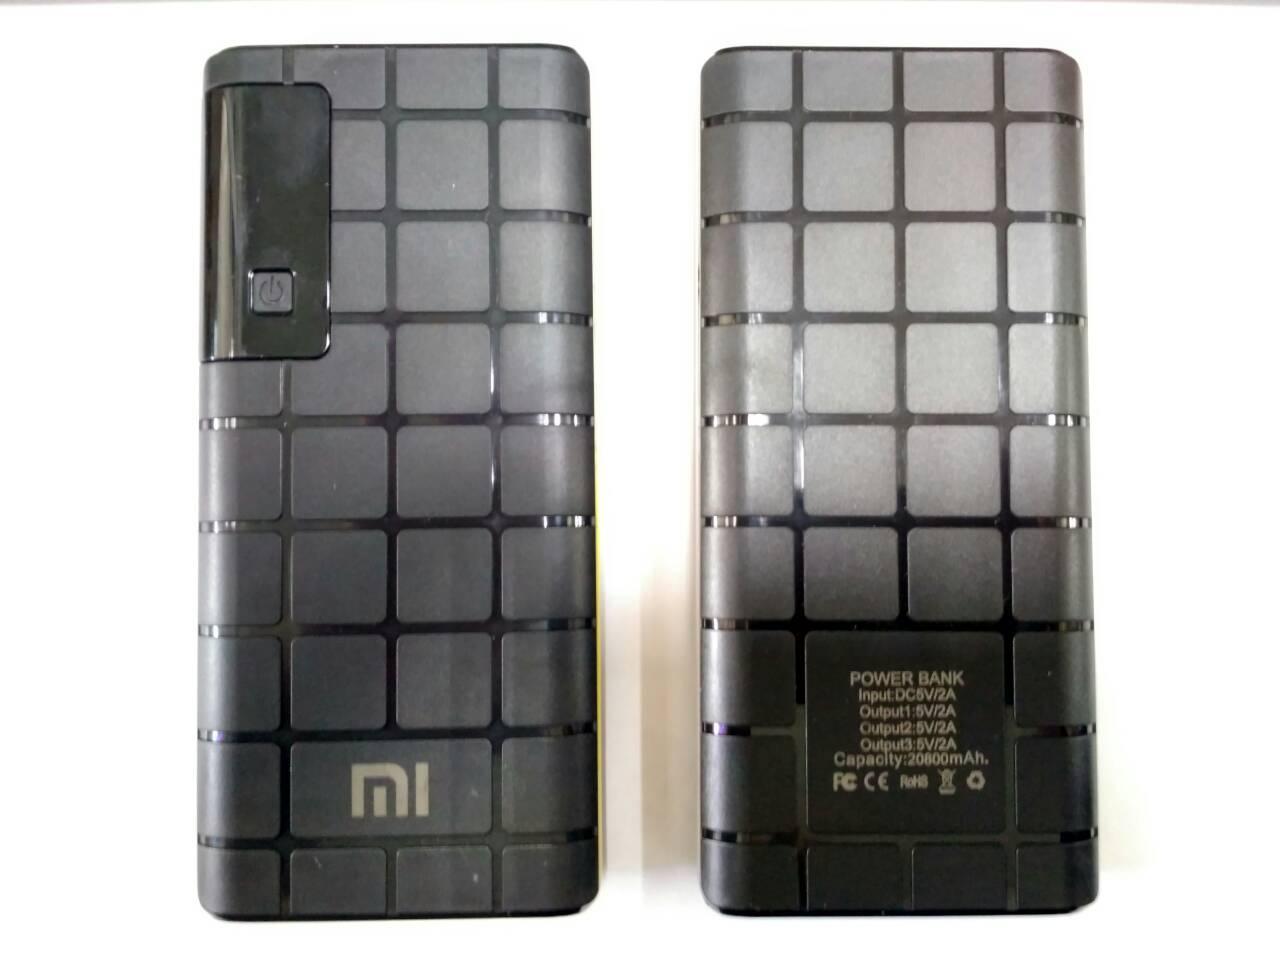 Power Bank Xiaomi 20800 mAhдисплей